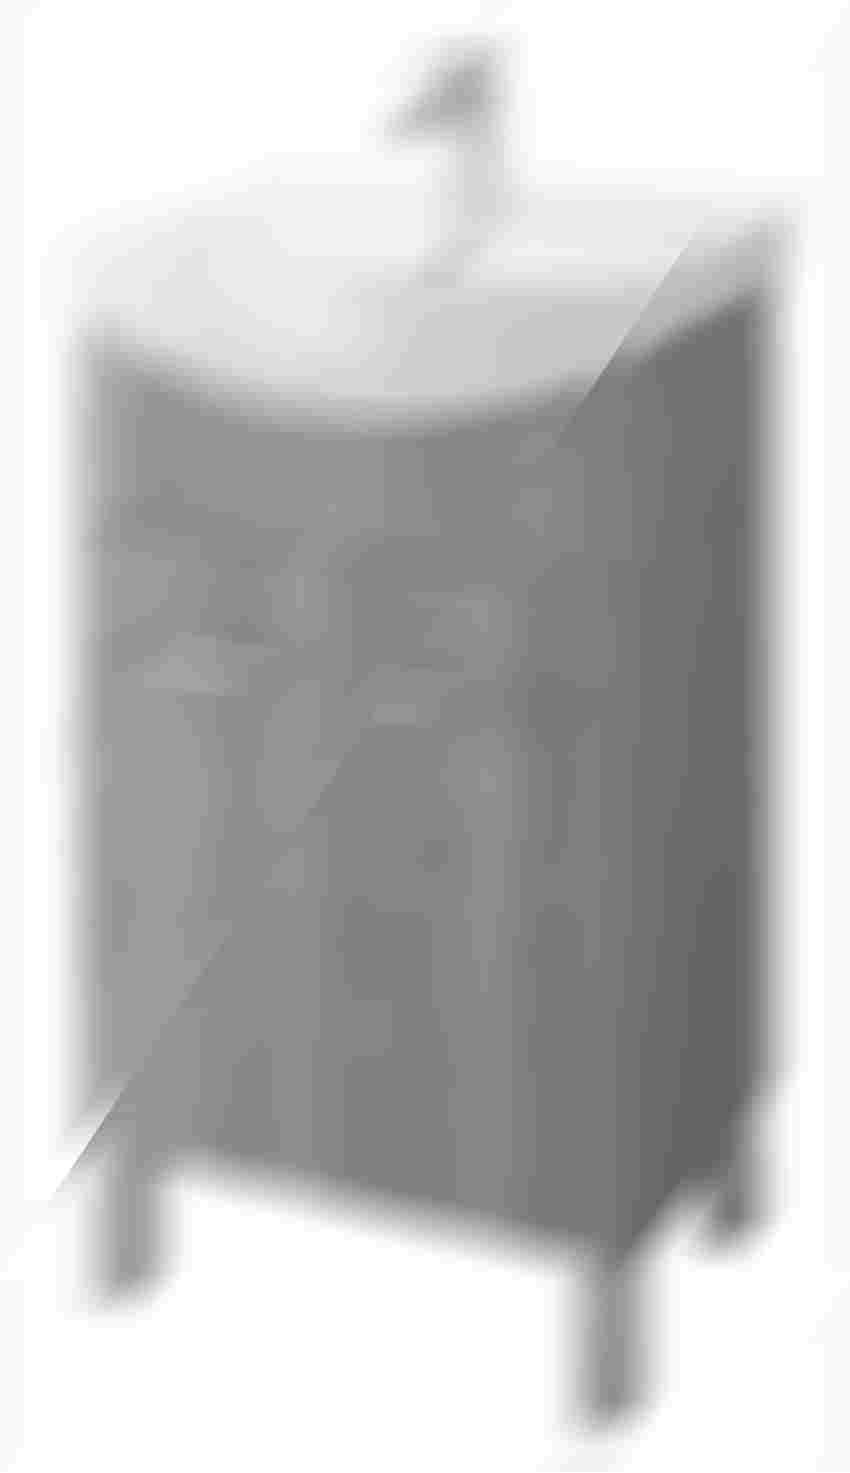 Szafka podumywalkowa orzech 31x46x80 cm Cersanit Olivia